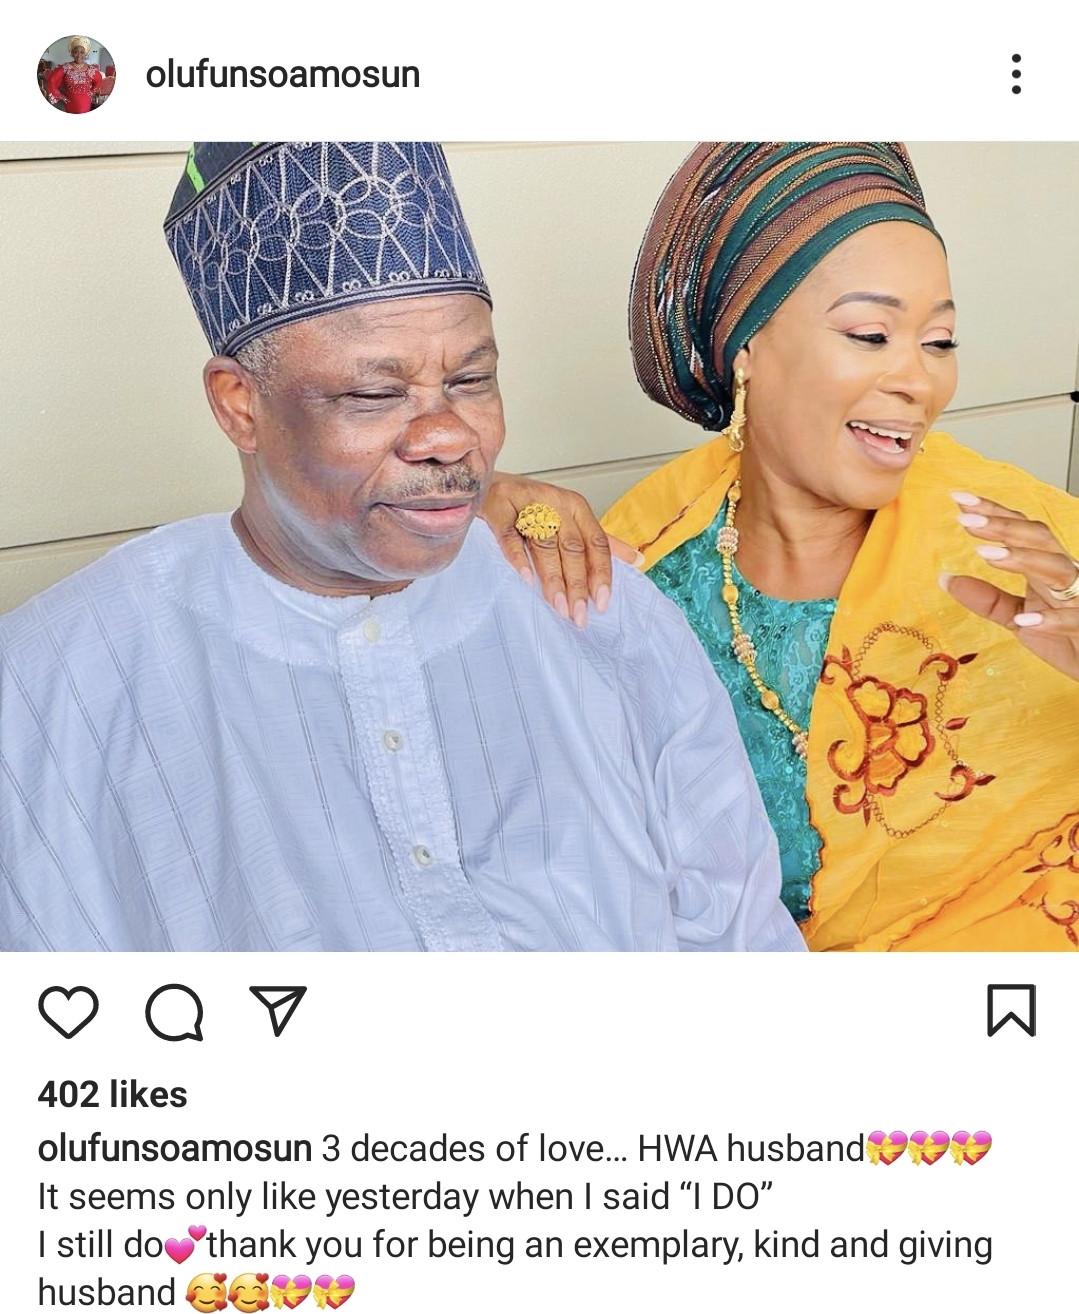 Former Ogun state governor, Ibikunle Amosun, and wife celebrate 30th wedding anniversary